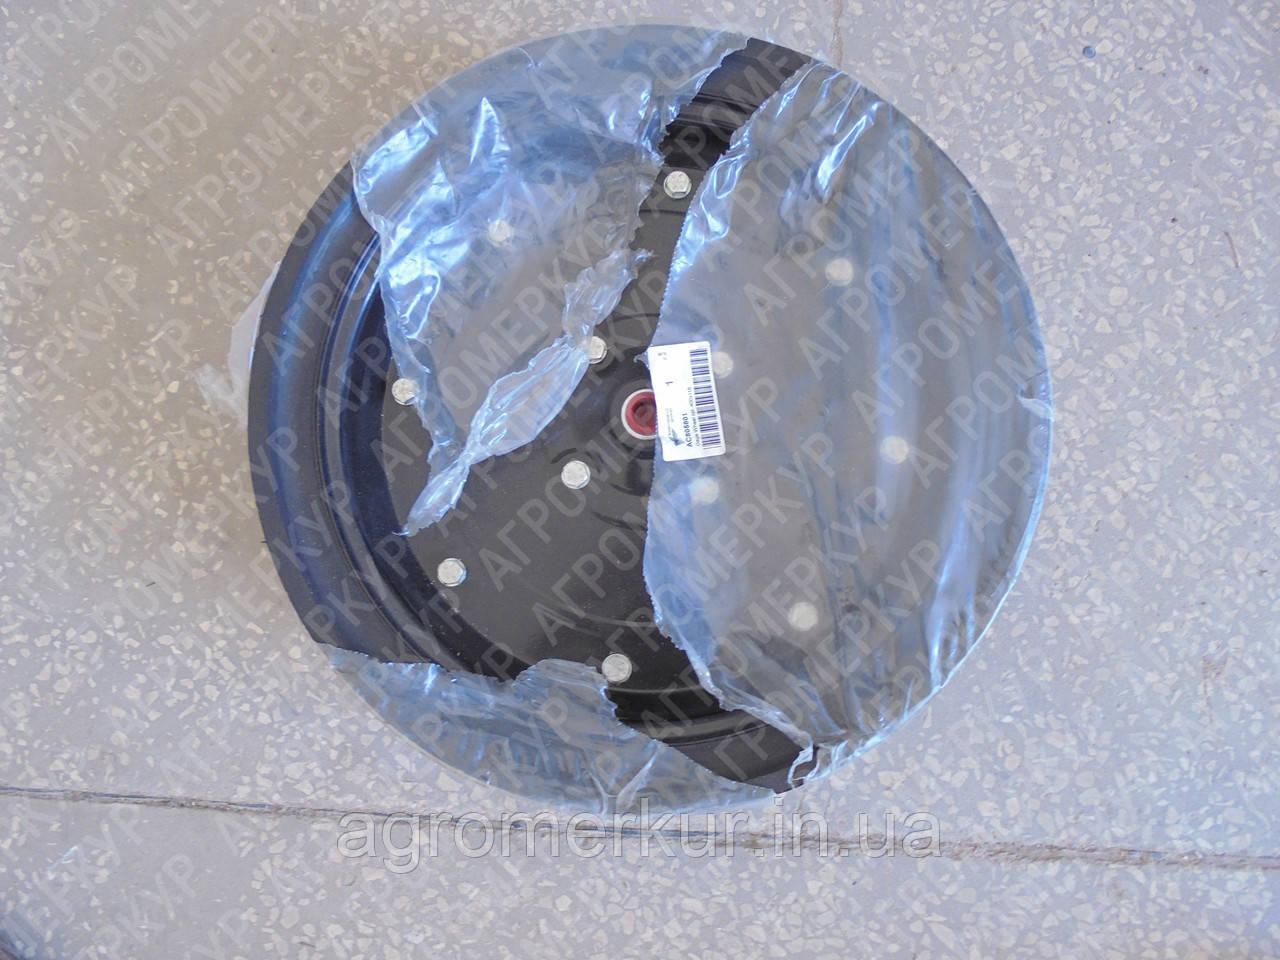 Колесо прикочуюче AC805801 Kverneland 400x115 OTICO FARMFLEX®